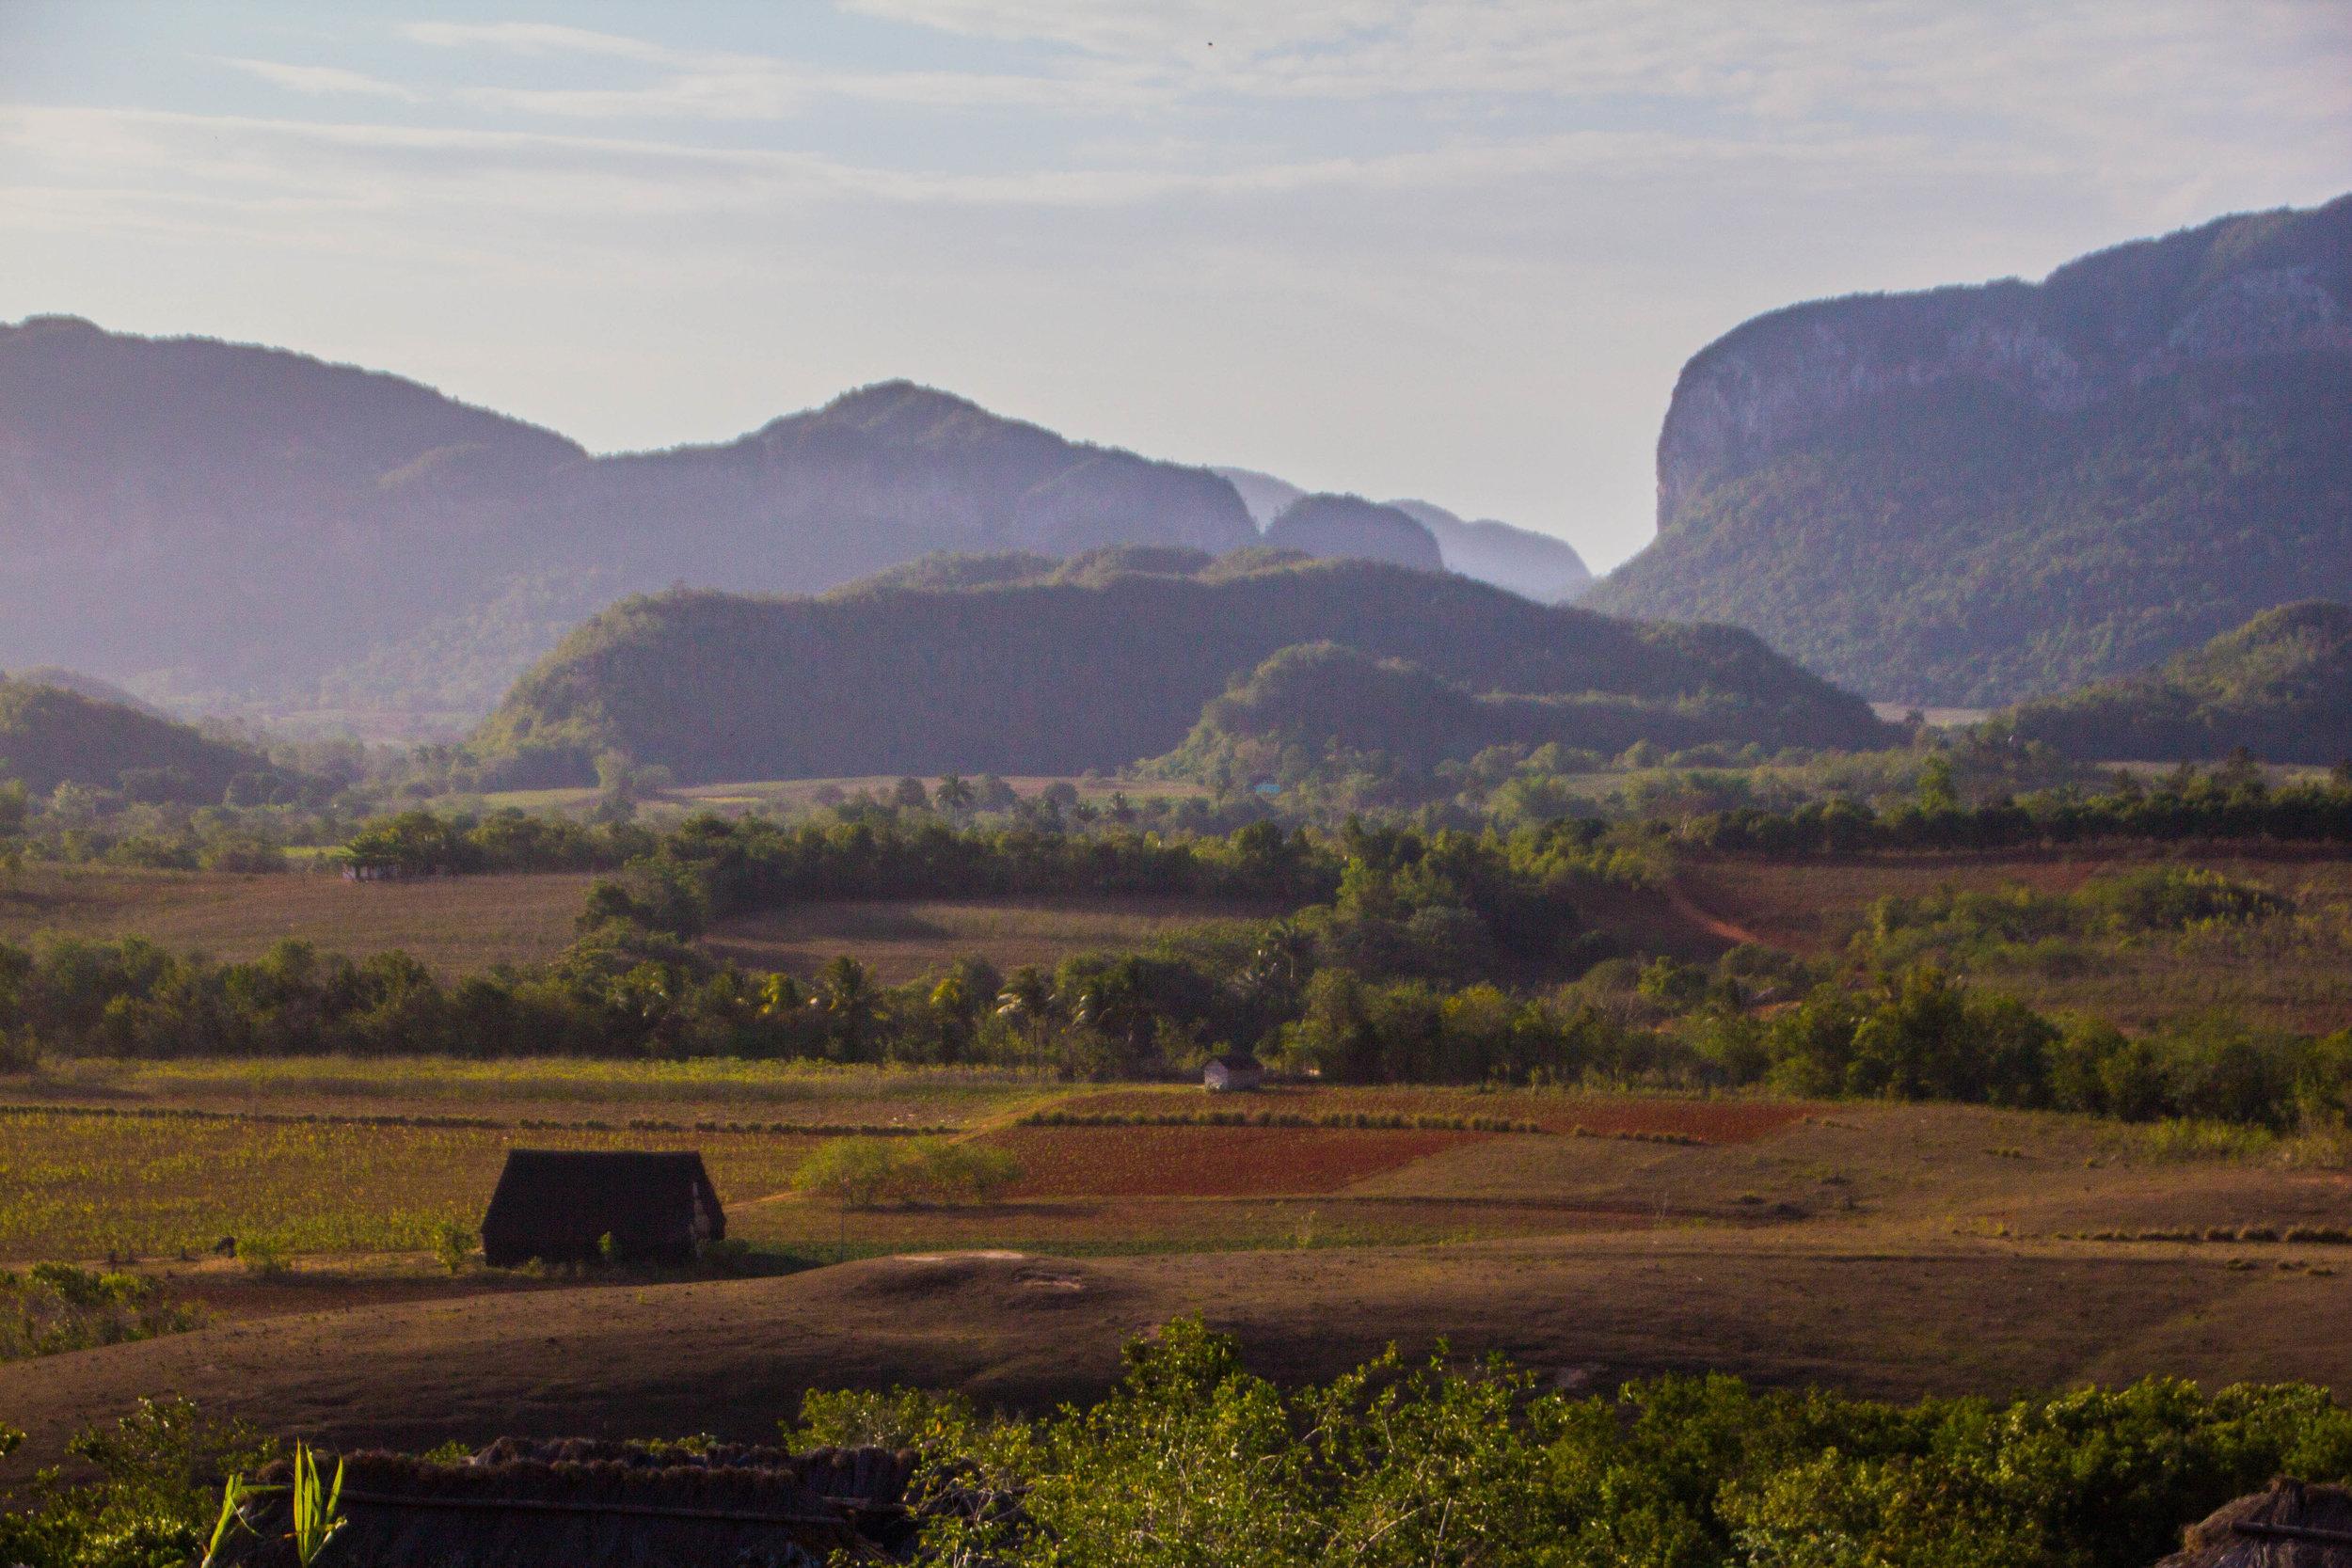 finca agroecological el paraiso restaurant viñales cuba-1-4-2.jpg